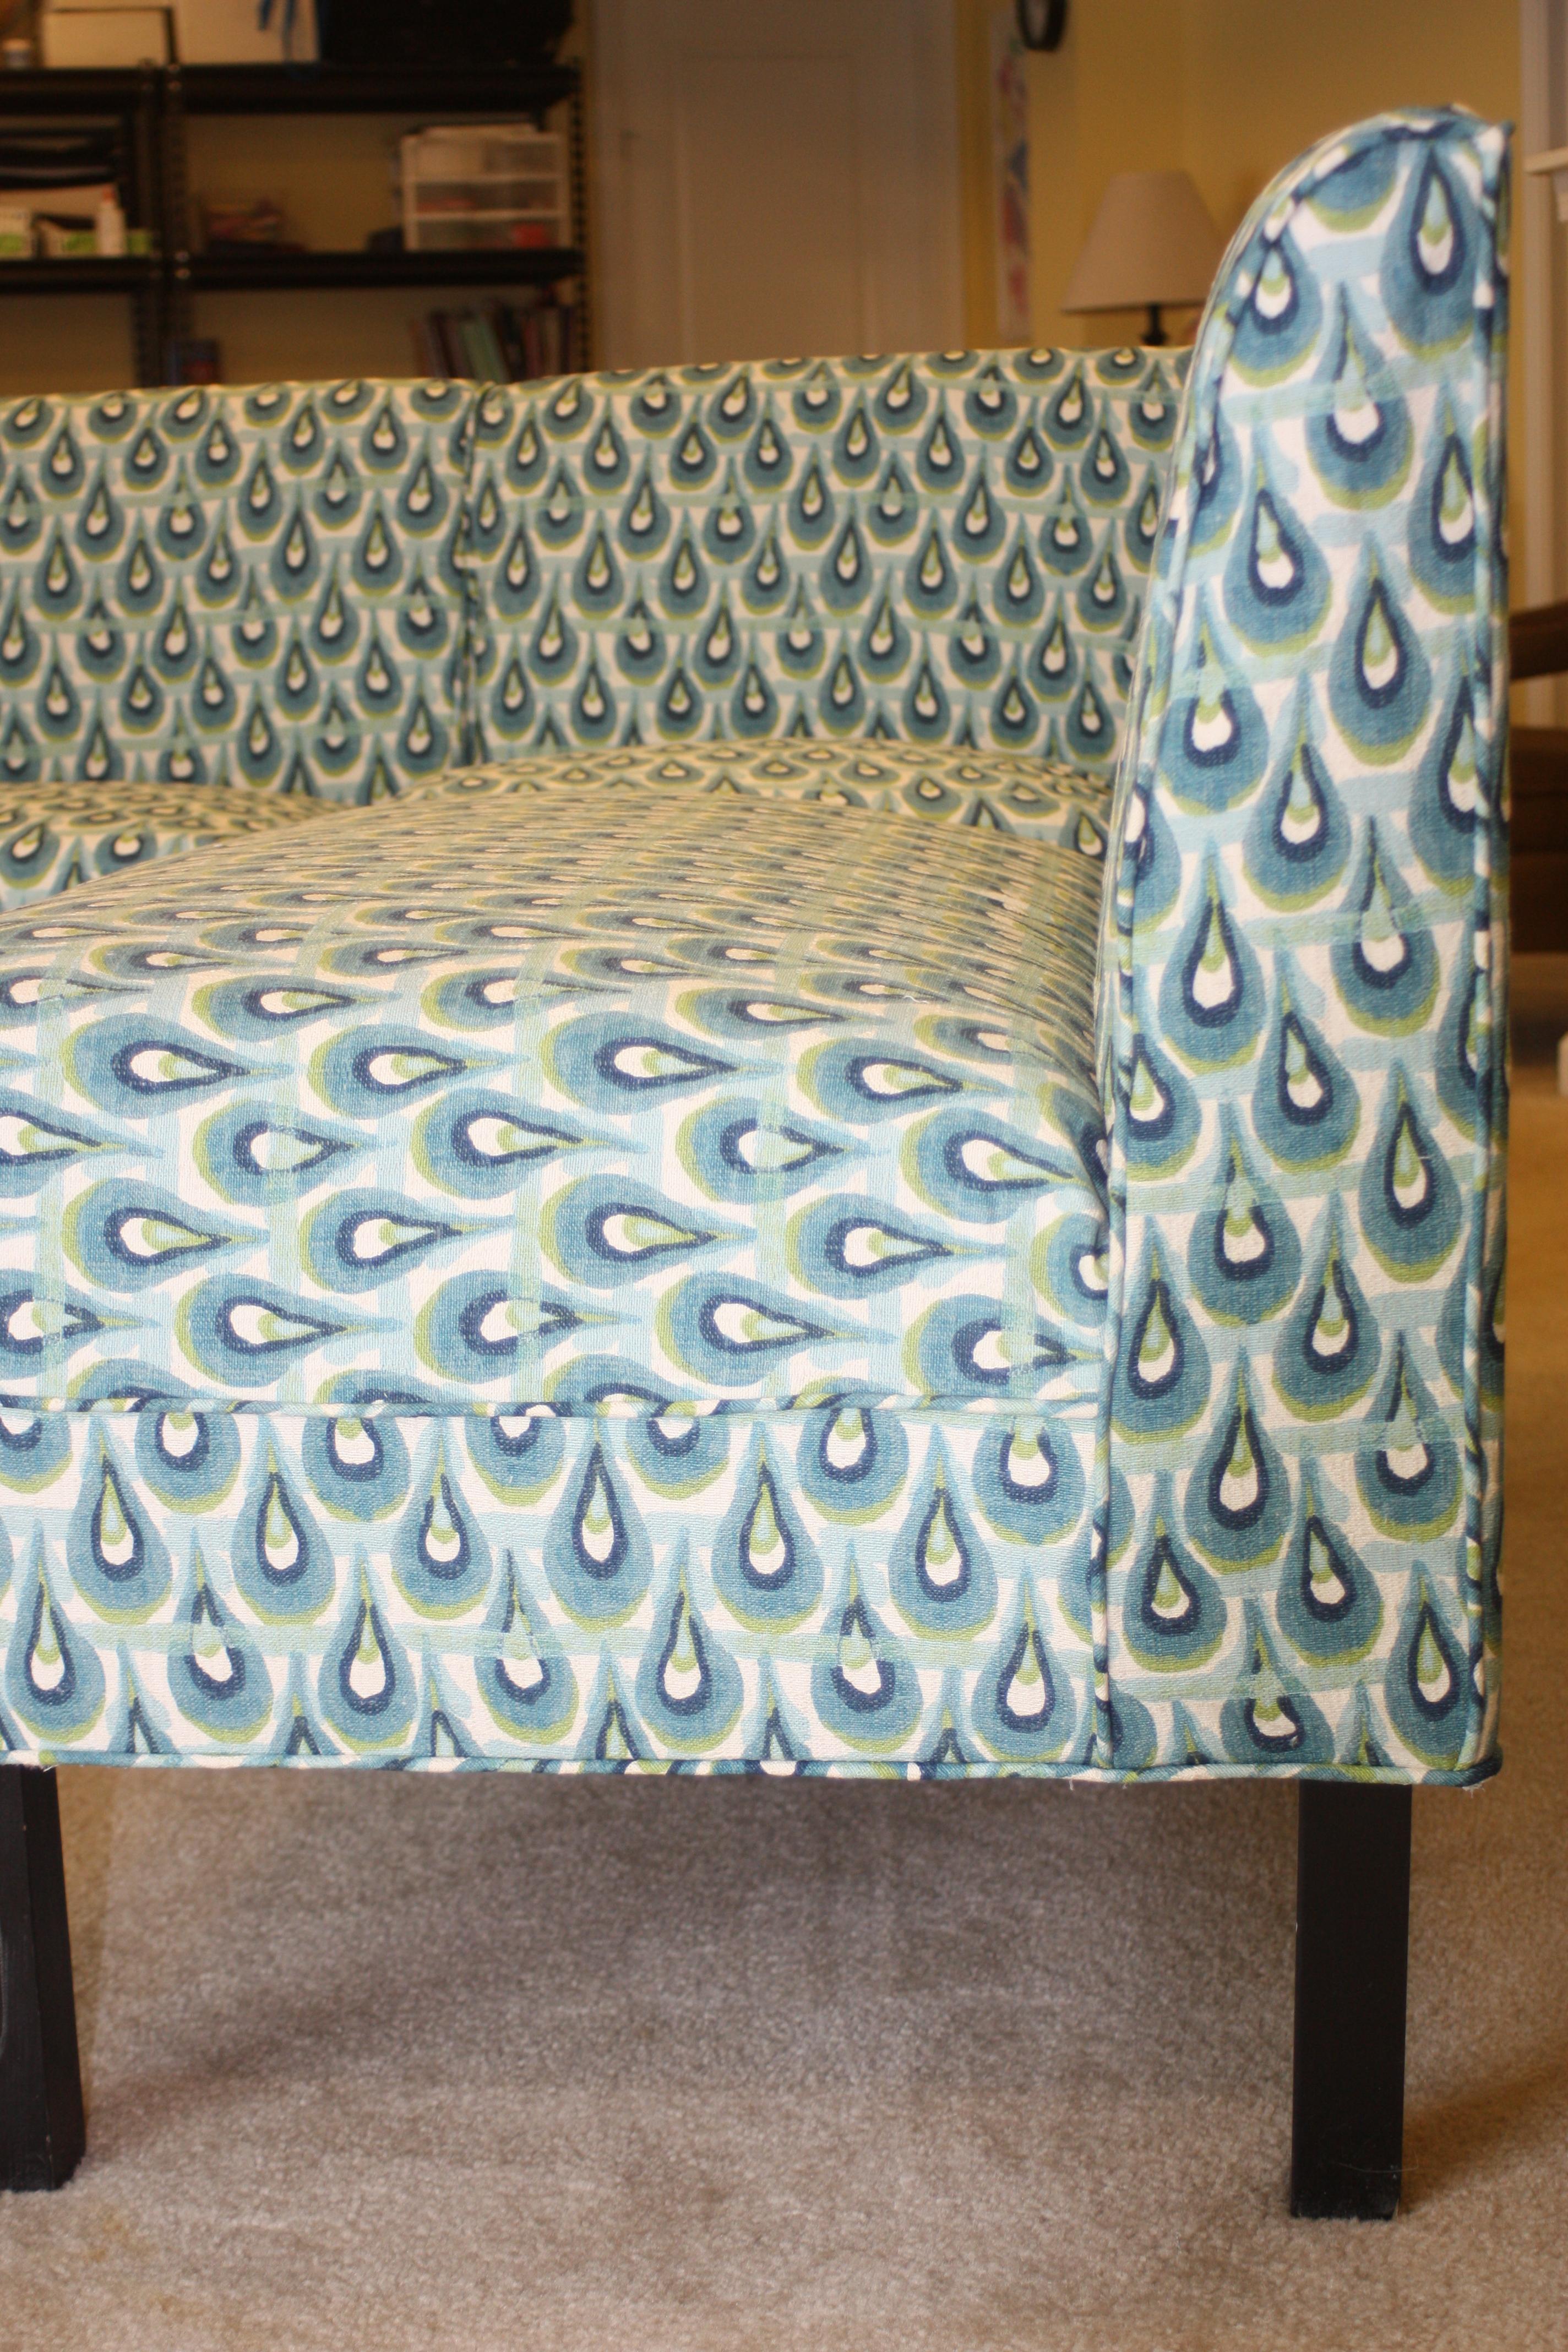 ballard designs dining chair slipcovers folding accessories project gallery twill slipcover studio